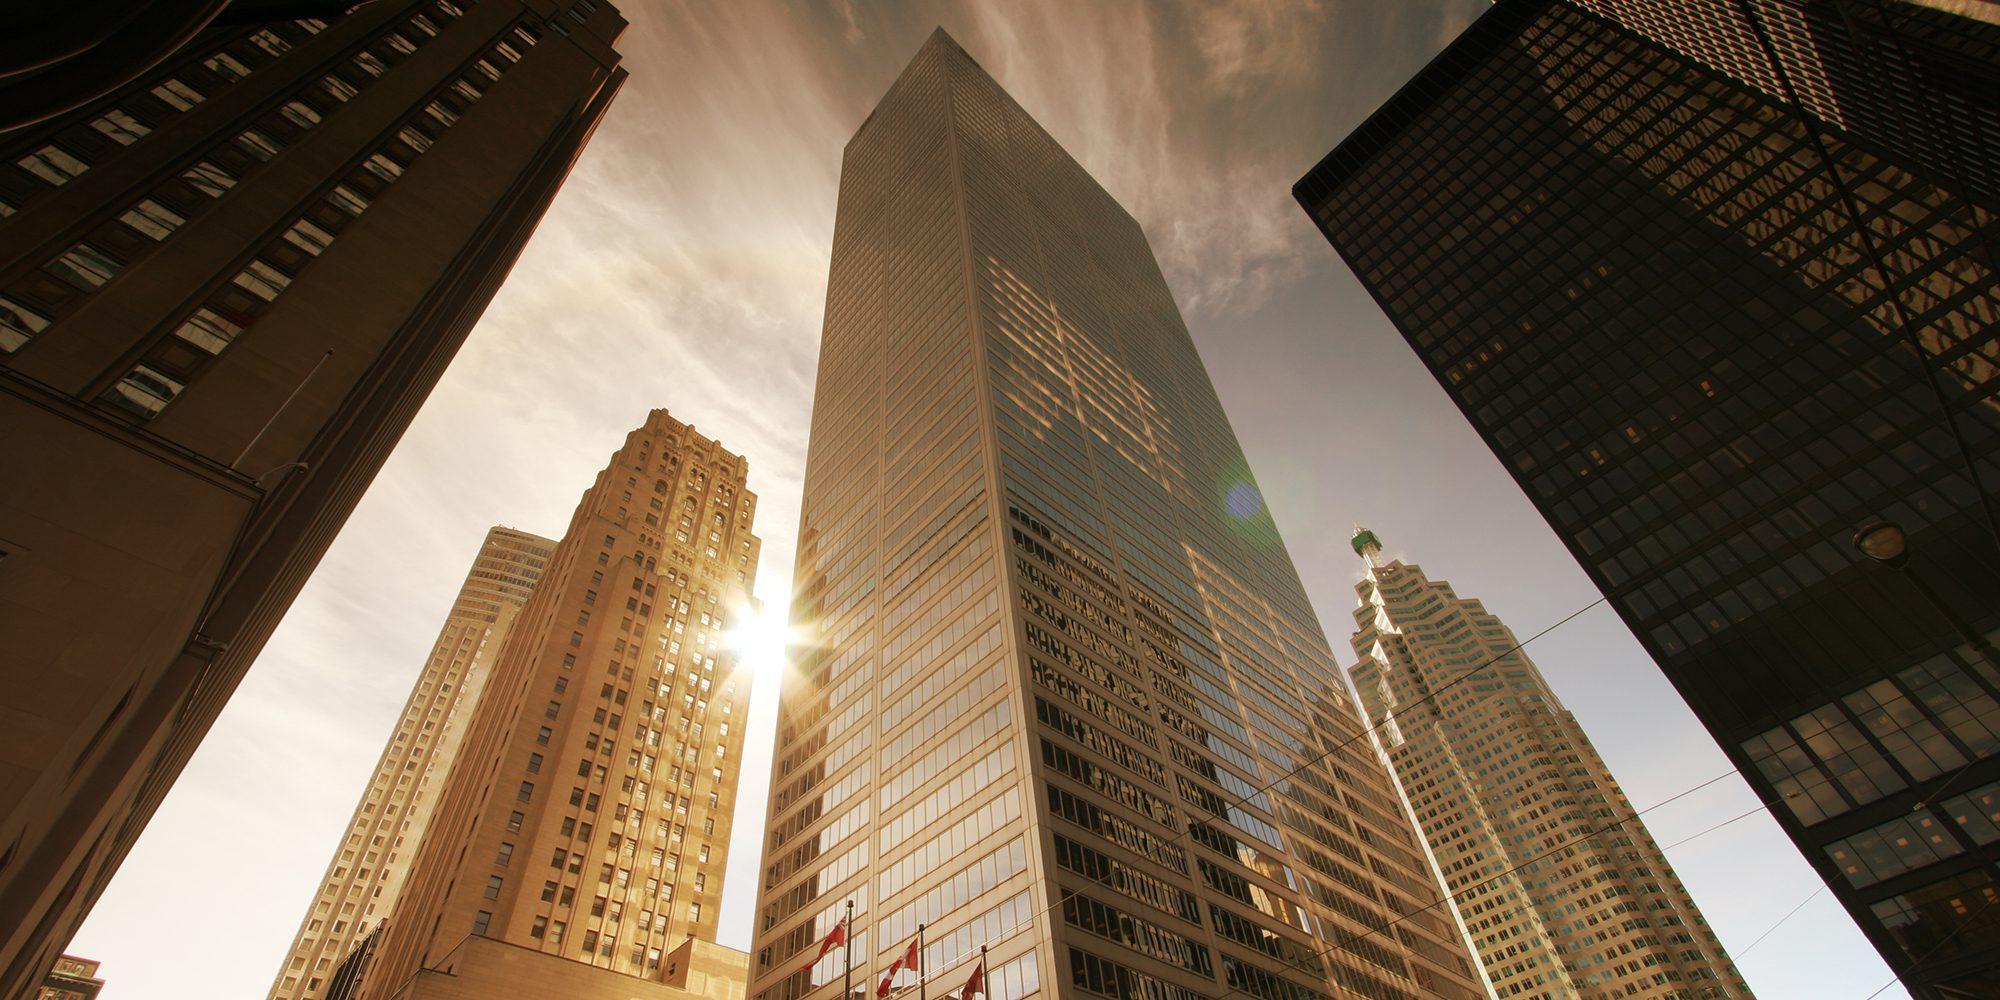 Toronto-Waterloo region climbs the latest rankings of the world's top startup ecosystems